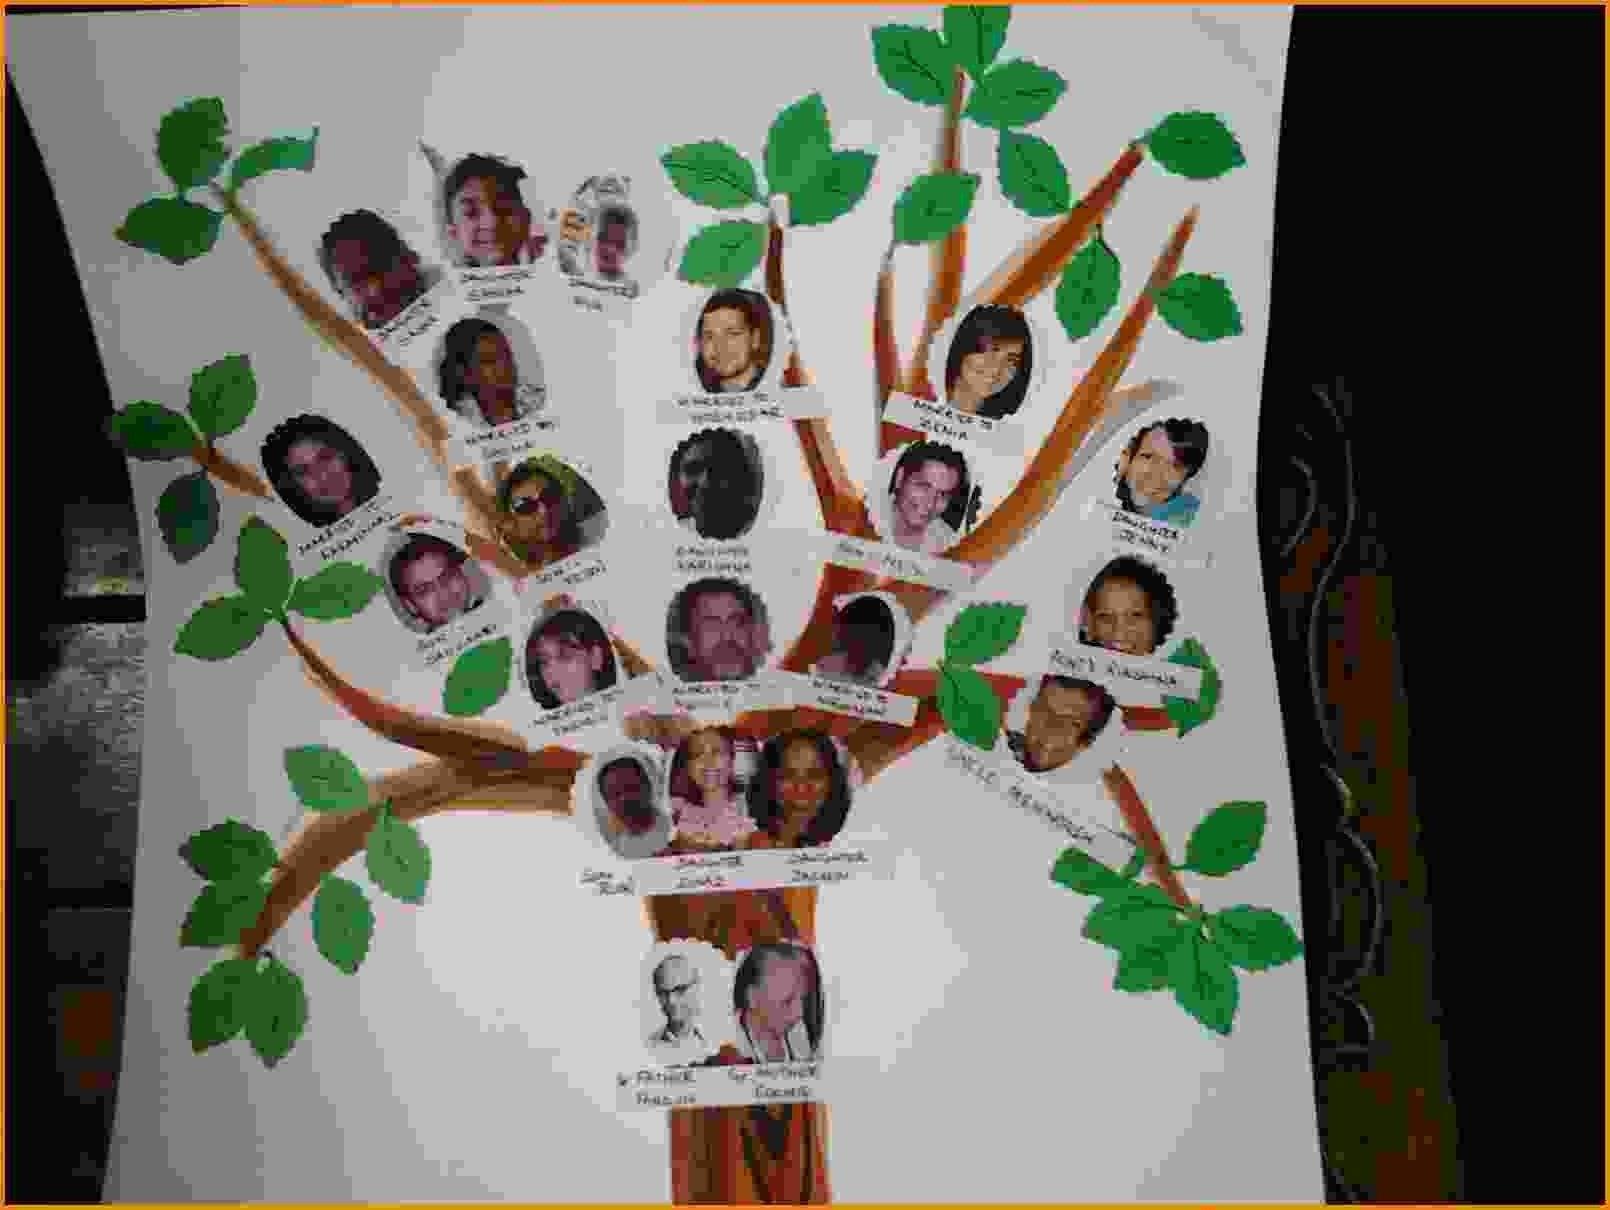 10 Famous Ideas For Family Tree Project unique family tree project ideas letterhead template sample final 2 2020